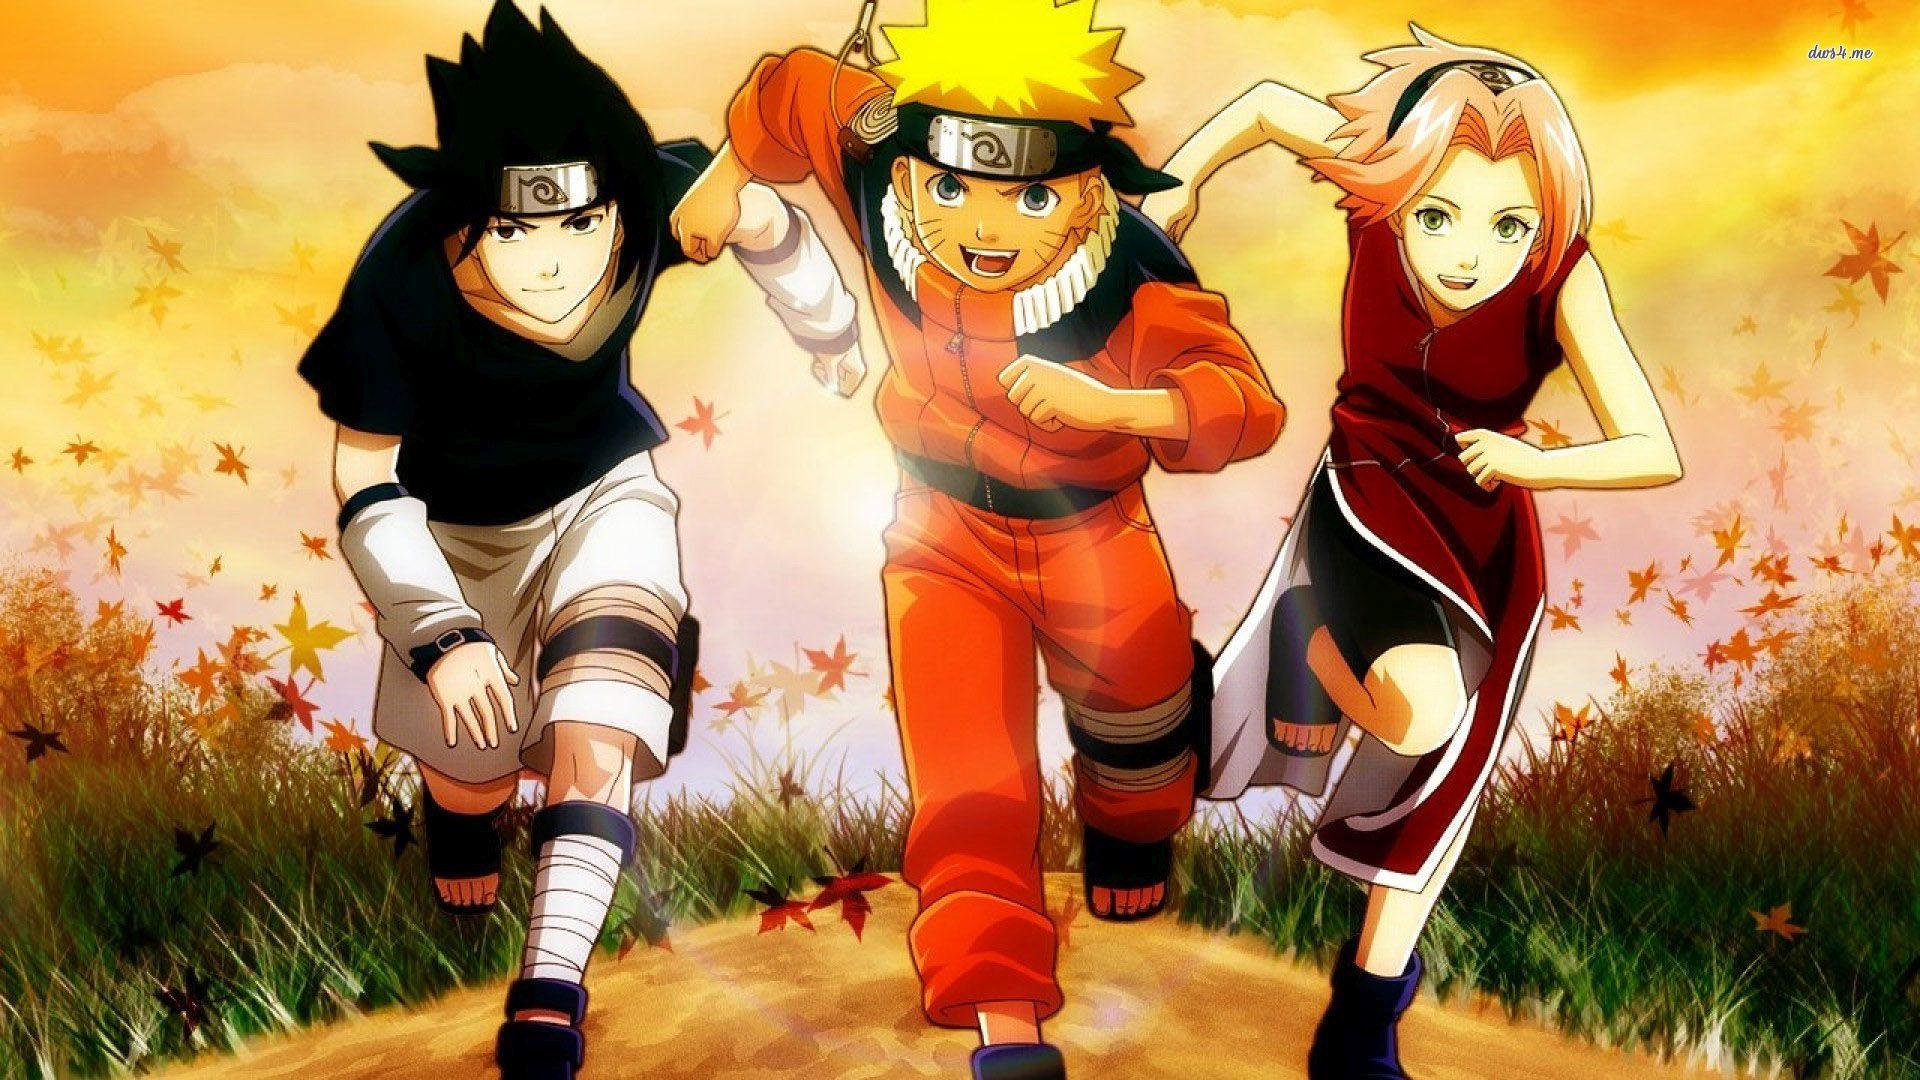 Cool Wallpaper Naruto Couple - Naruto-Pic-Wallpapers-029  Trends_32457.jpg